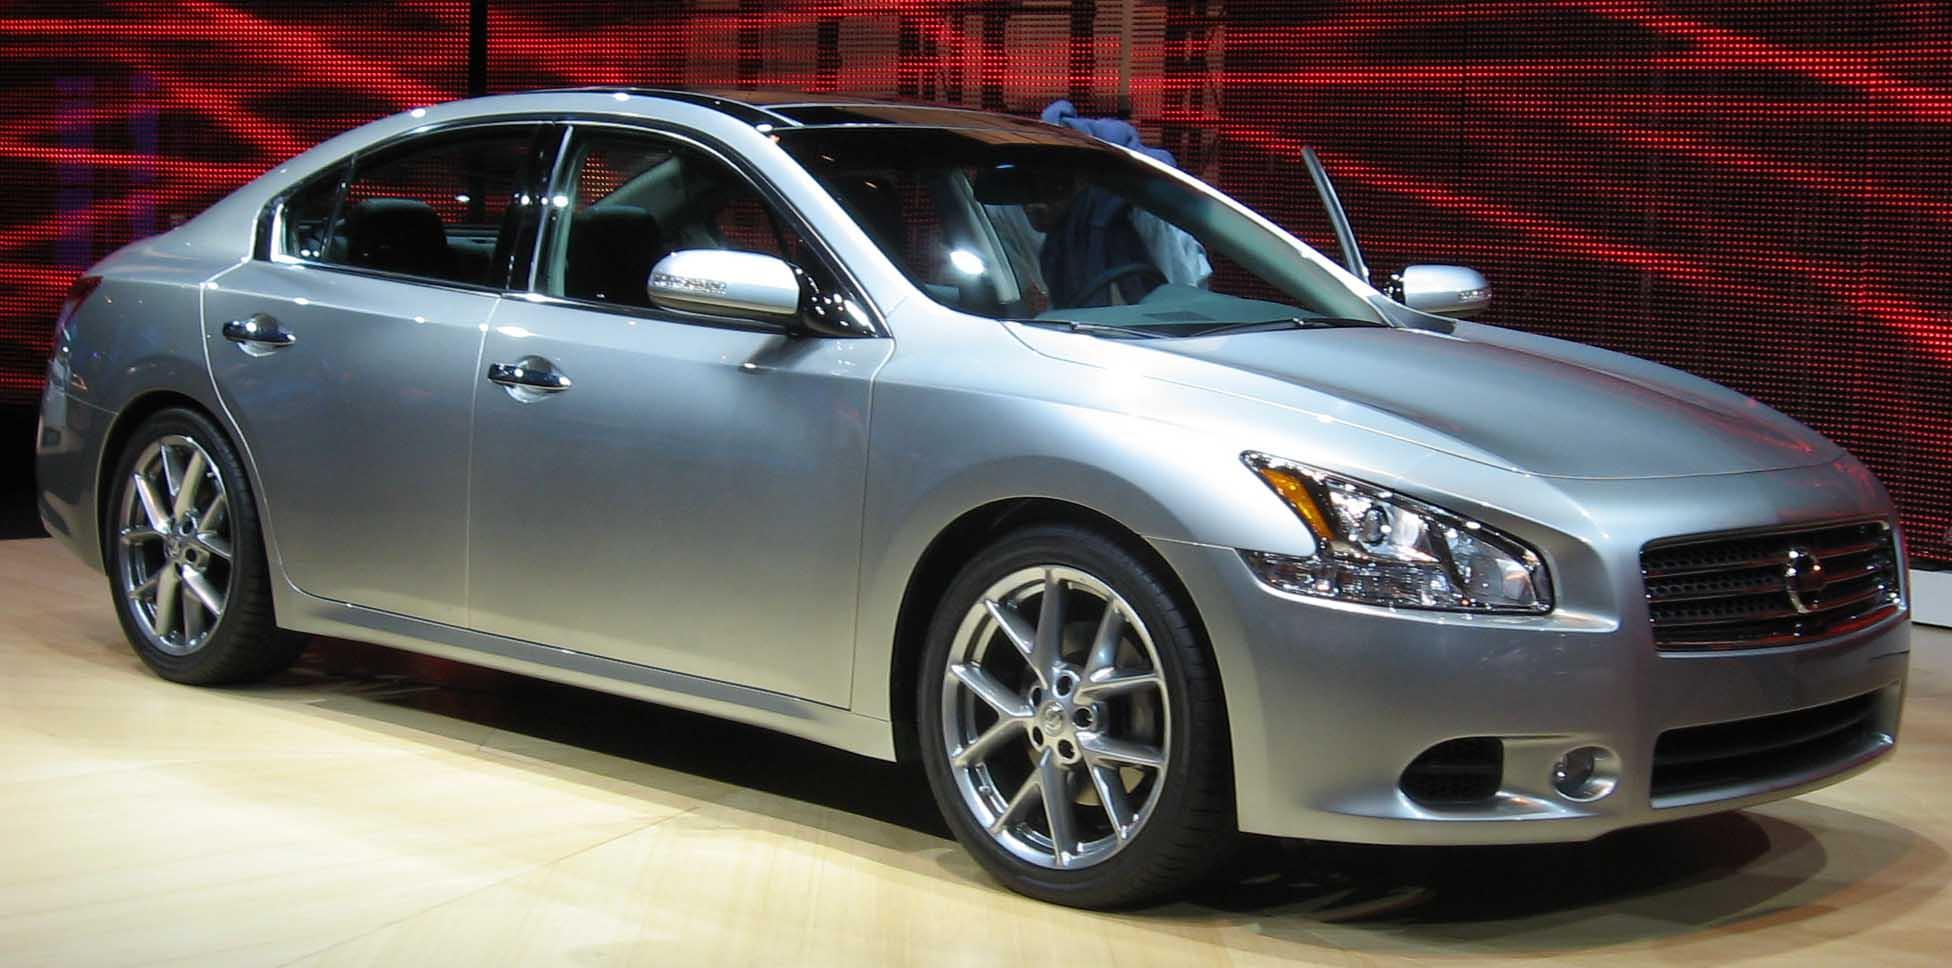 2009 Nissan Maxima Picture